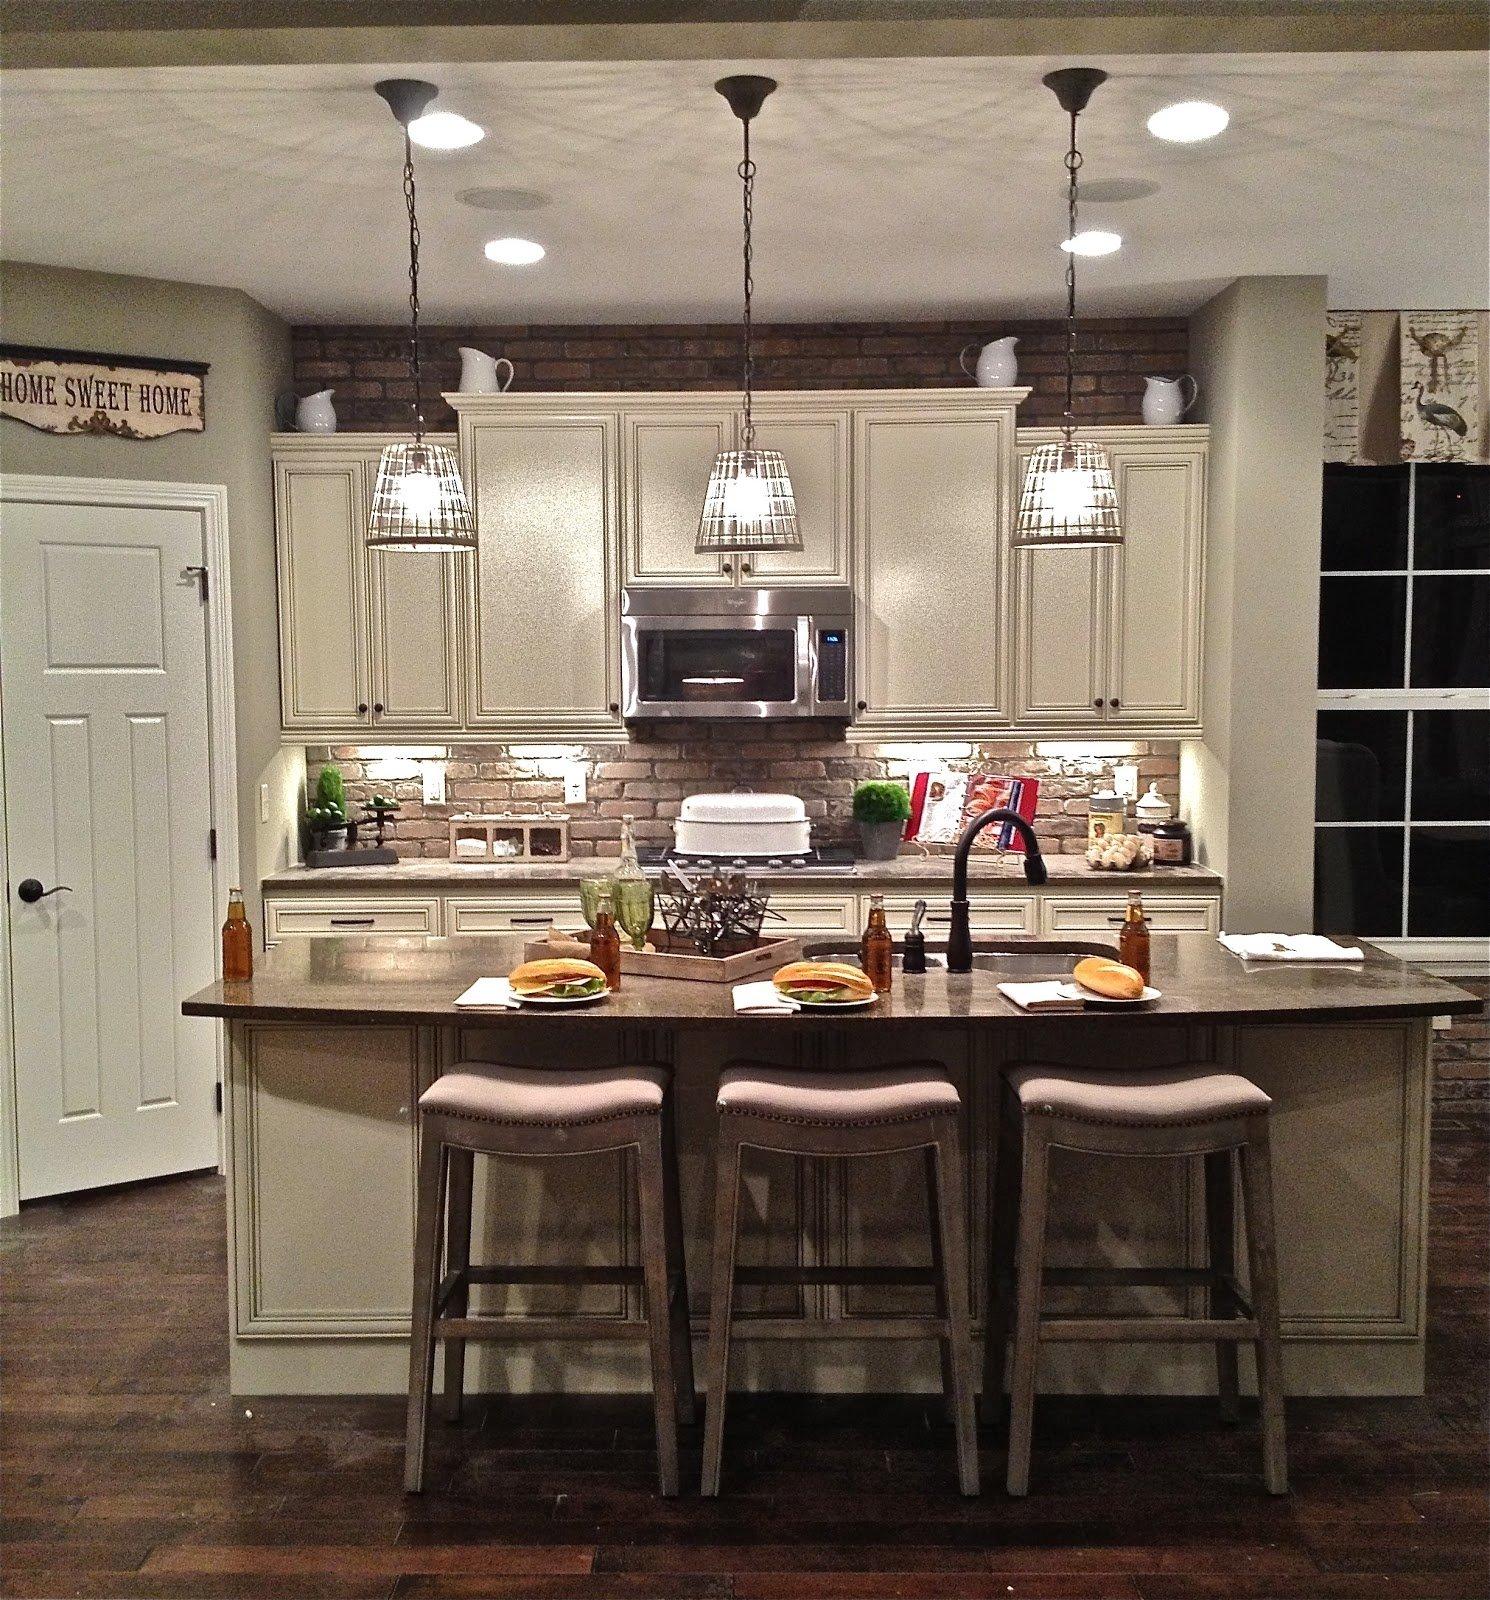 10 Attractive Kitchen Island Lighting Ideas Pictures small kitchen island pendants ideas collaborate decors kitchen 2020